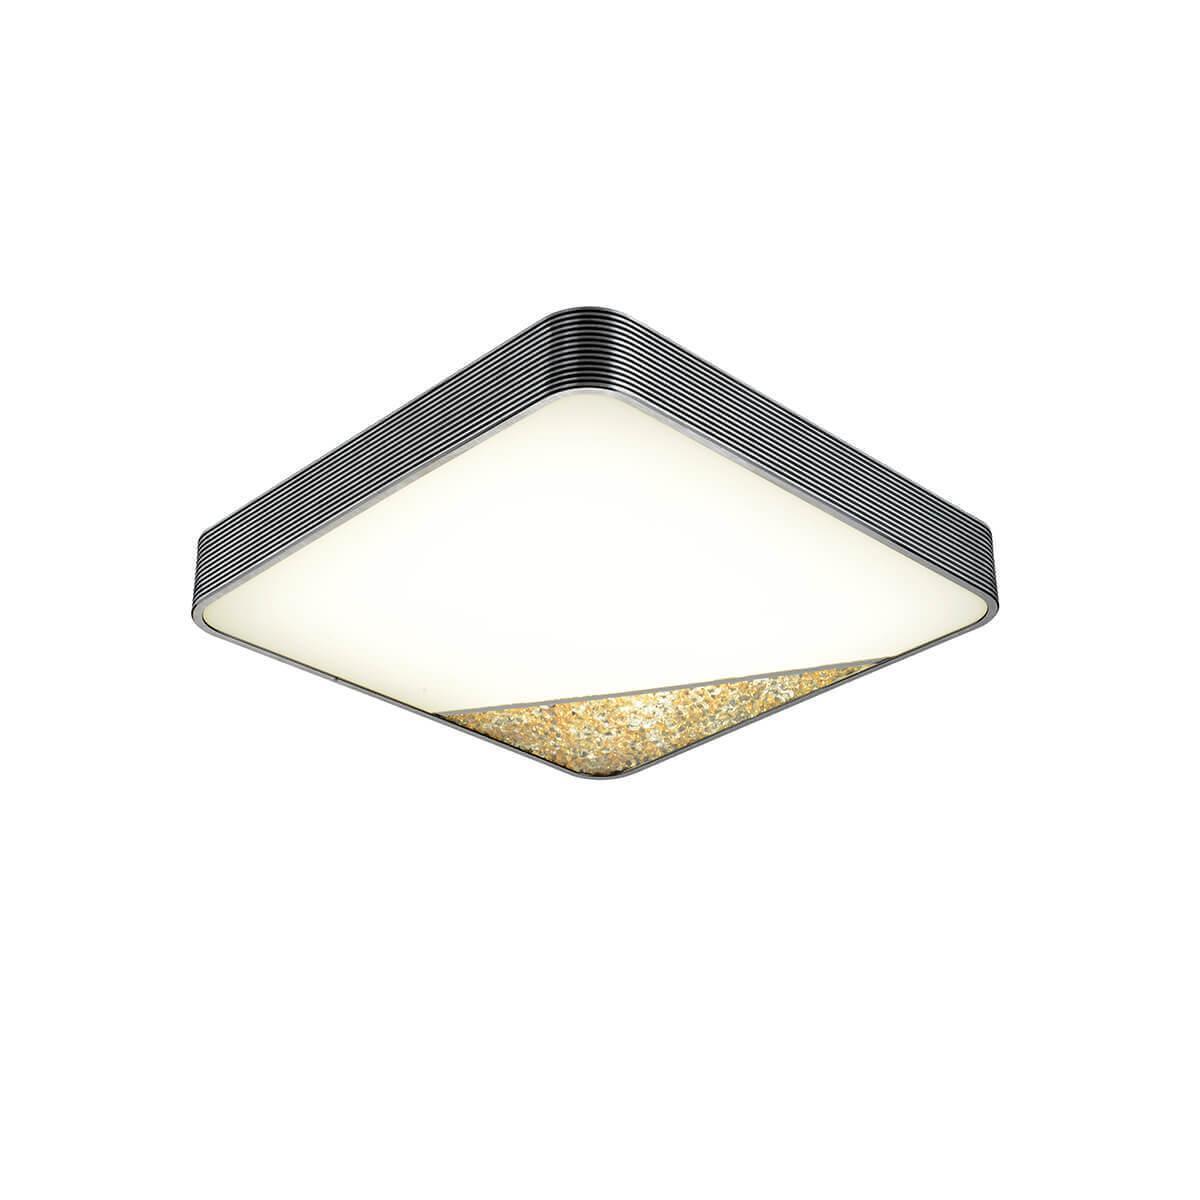 Накладной светильник Omnilux OML-45617-45, LED, 7.5 Вт